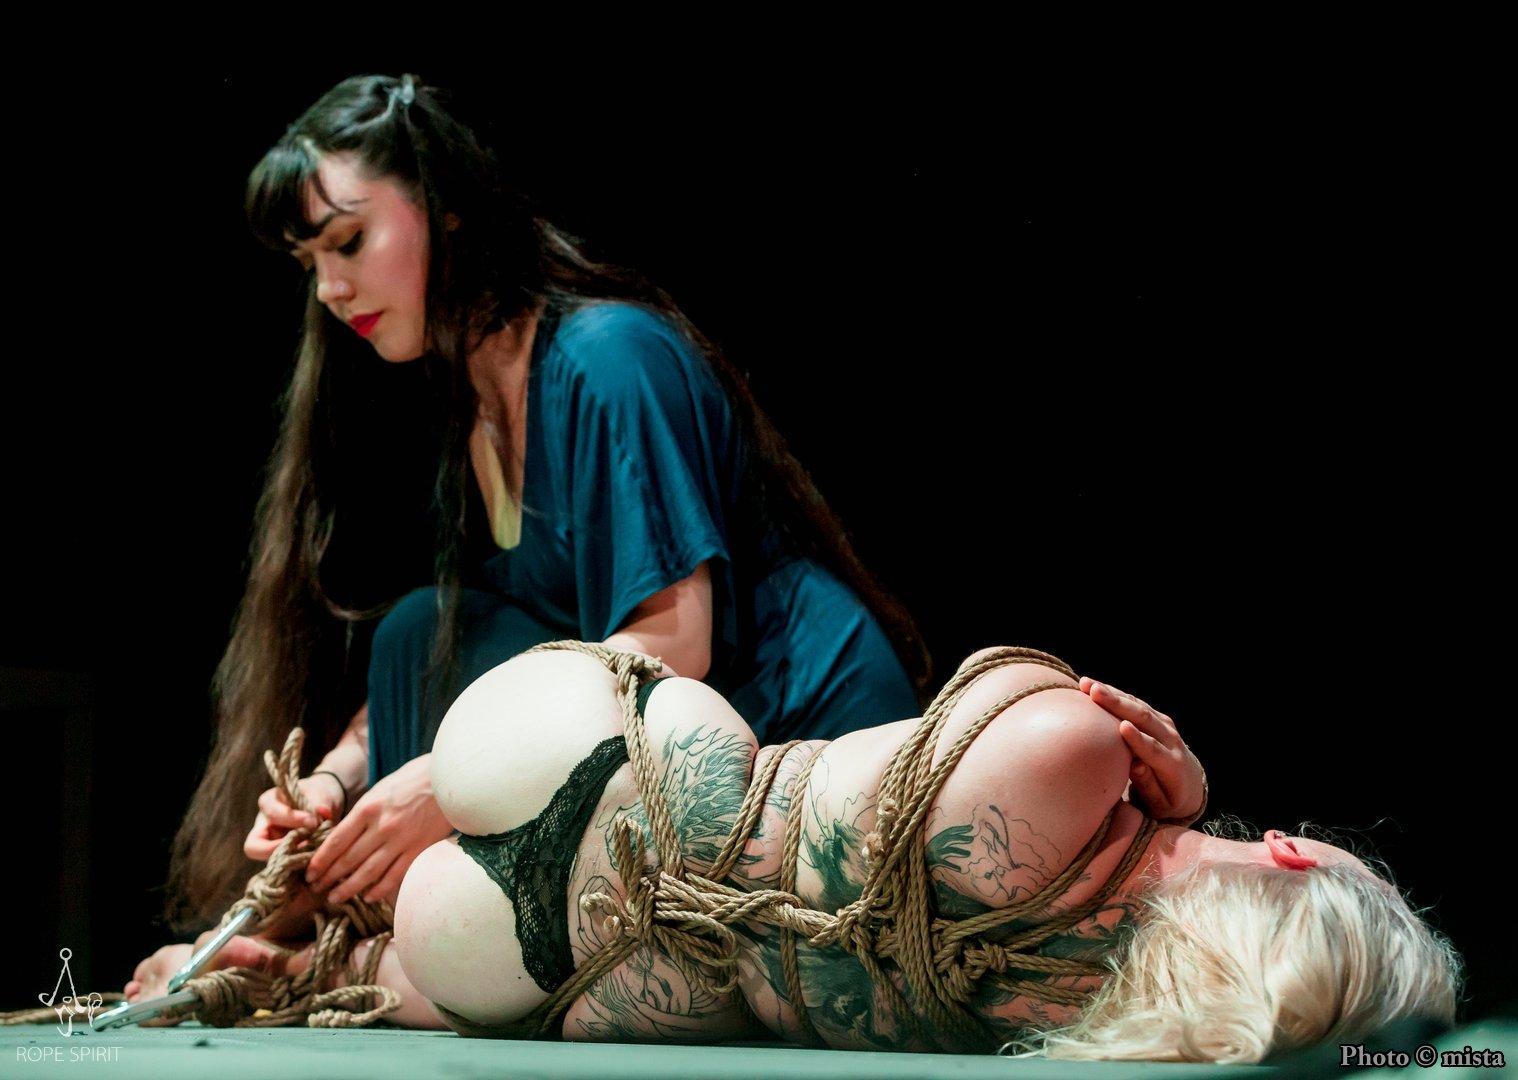 Shibari performance by Gestalta and Anea Capaken in Prague, Rope Spirit 2016